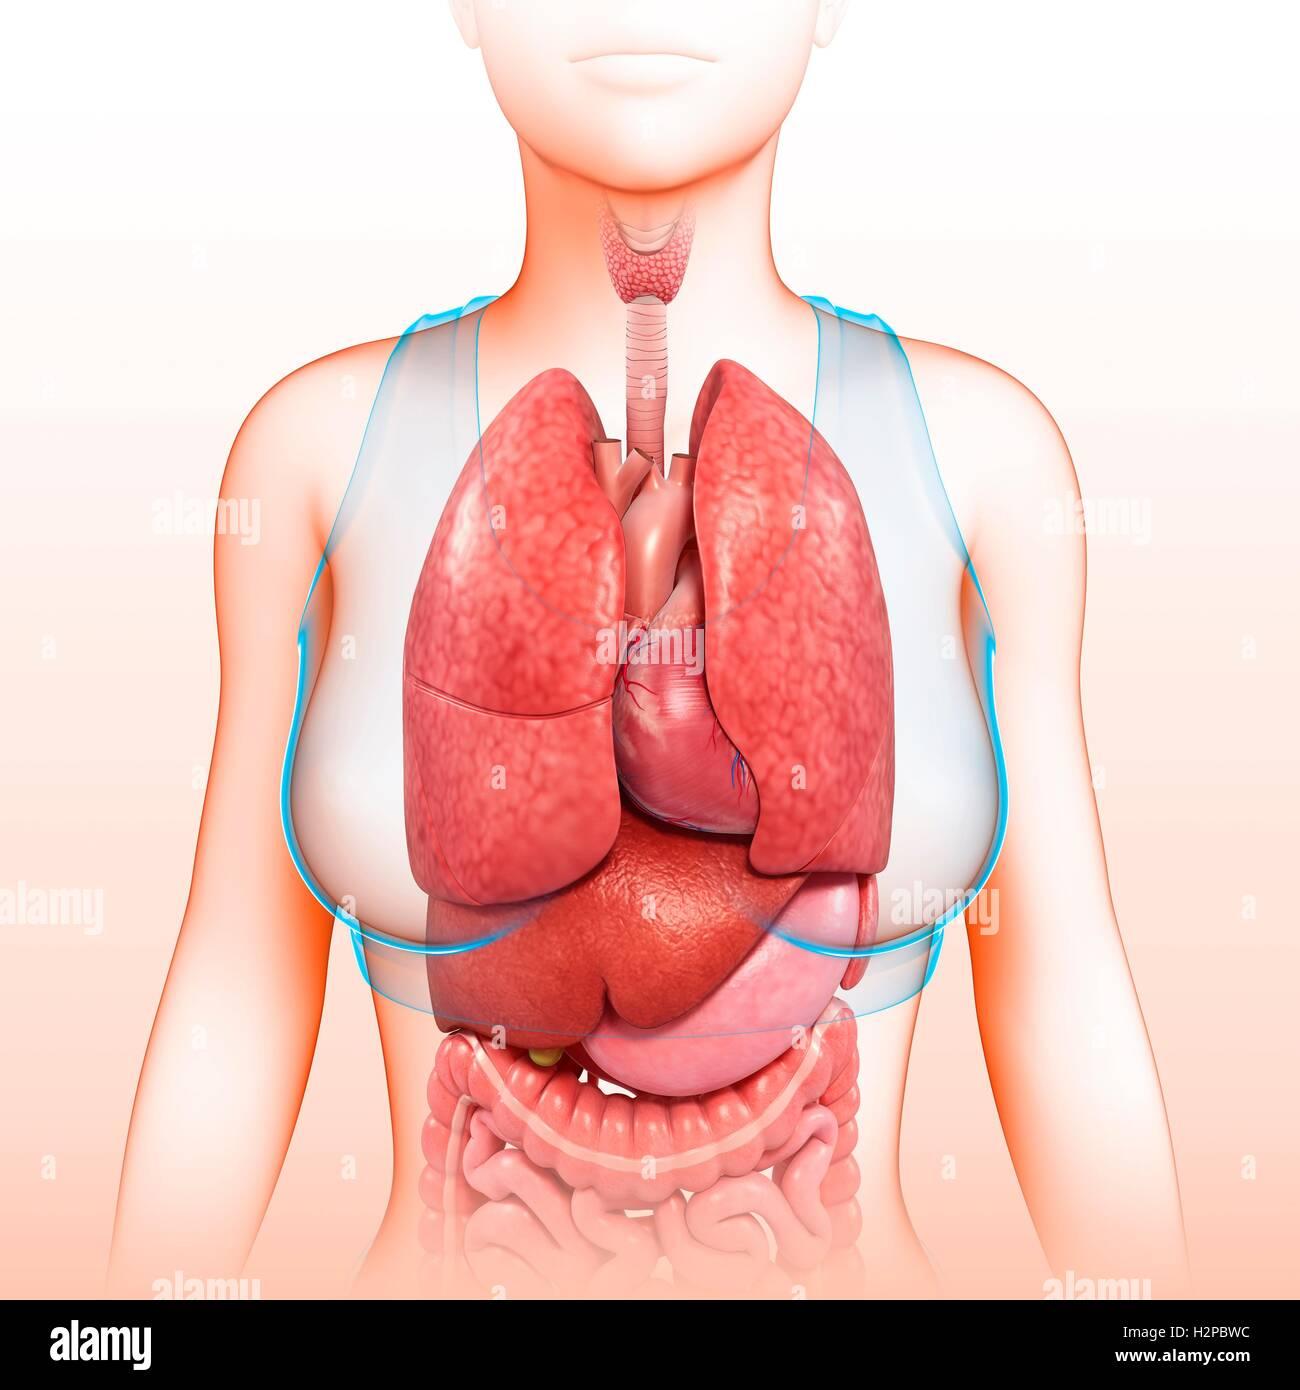 Human Body Female Organs Stockfotos & Human Body Female Organs ...